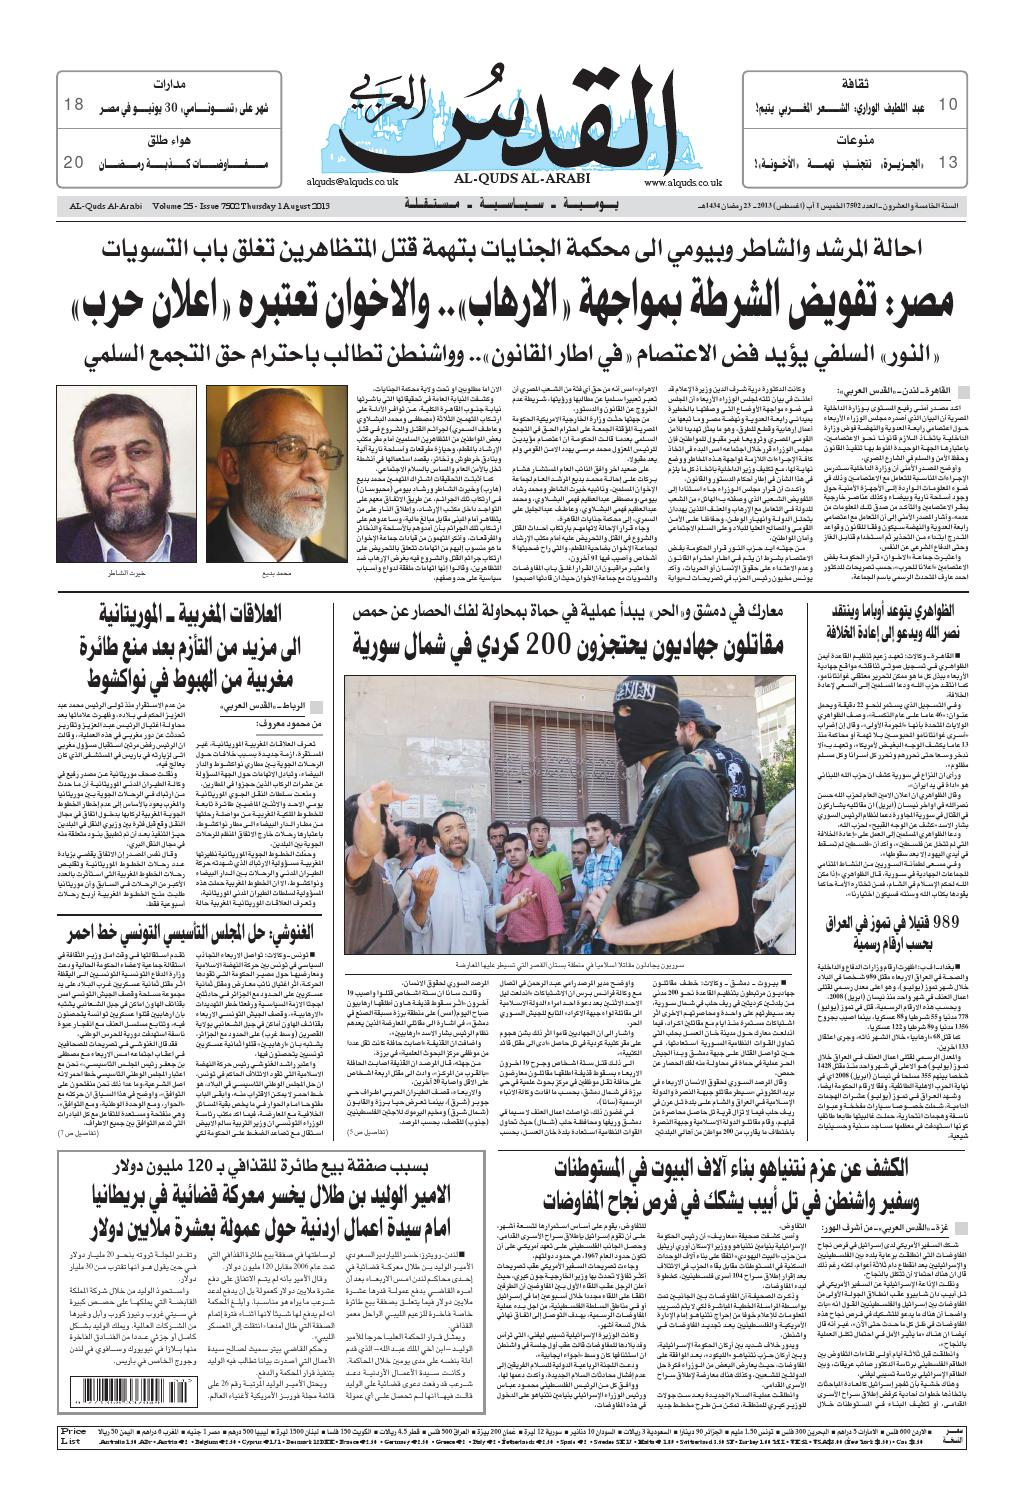 6f497539c صحيفة القدس العربي , الخميس 01.08.2013 by مركز الحدث - issuu